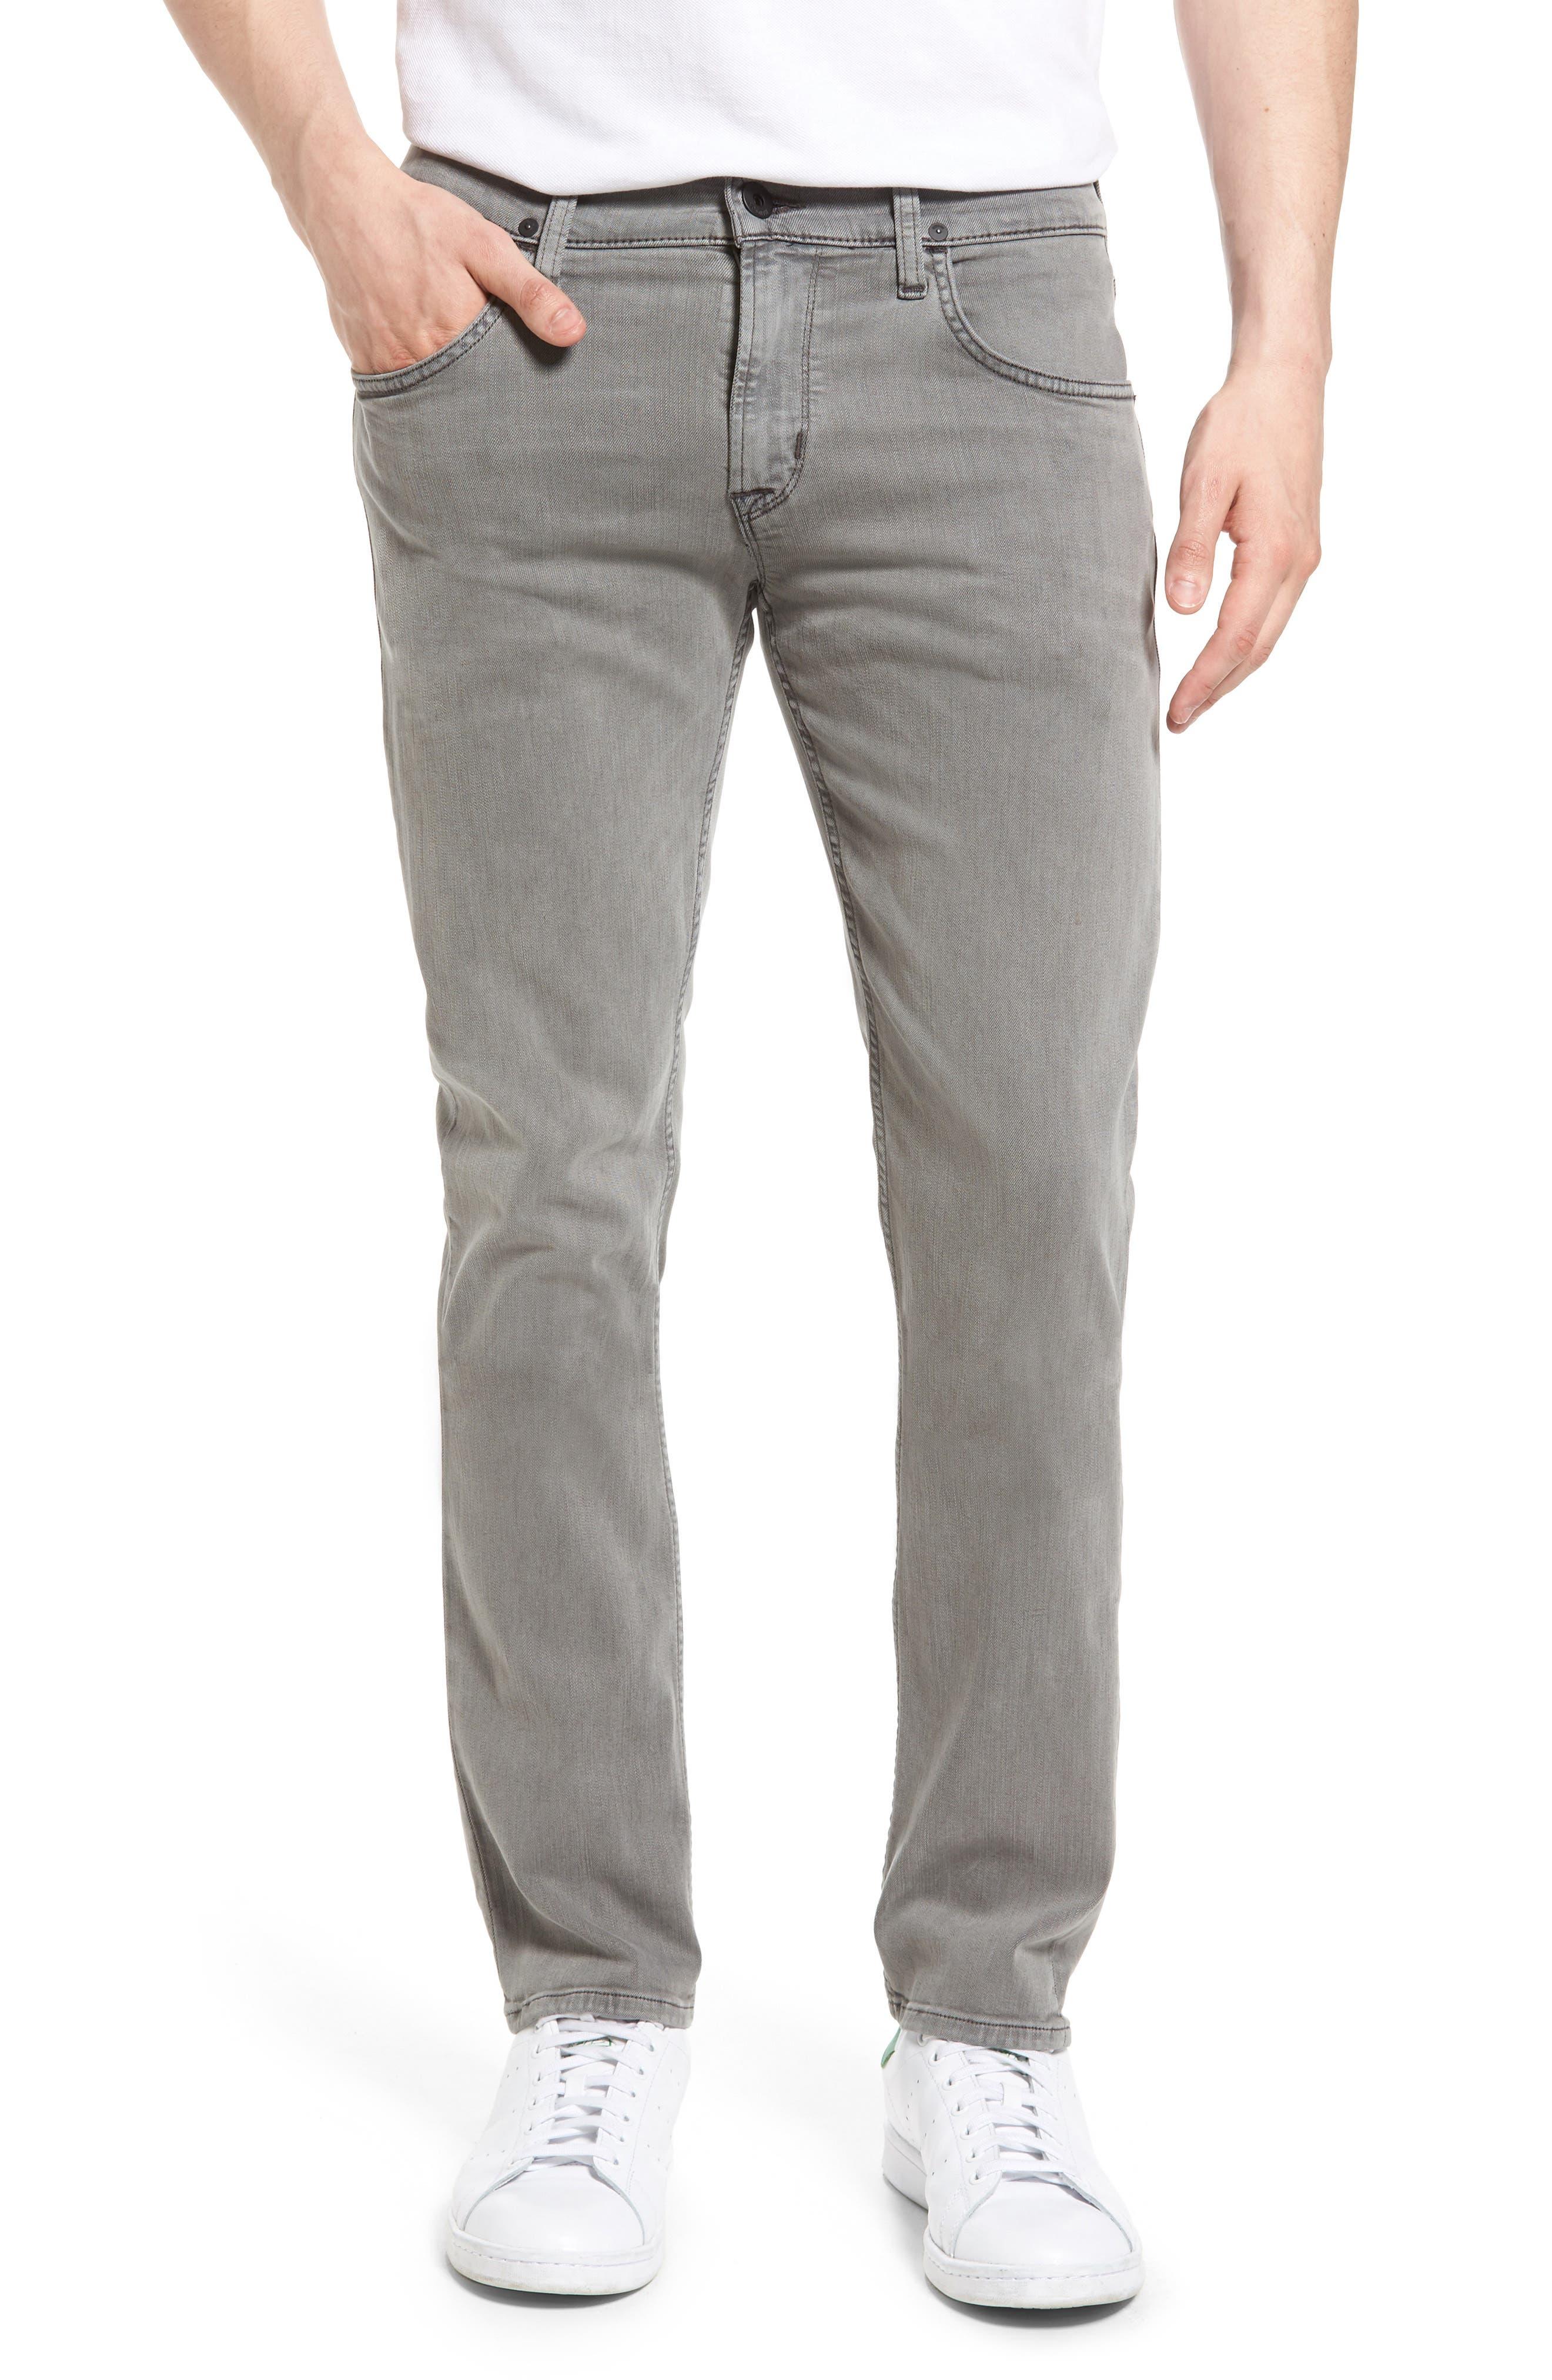 Blake Slim Fit Jeans,                             Main thumbnail 1, color,                             023